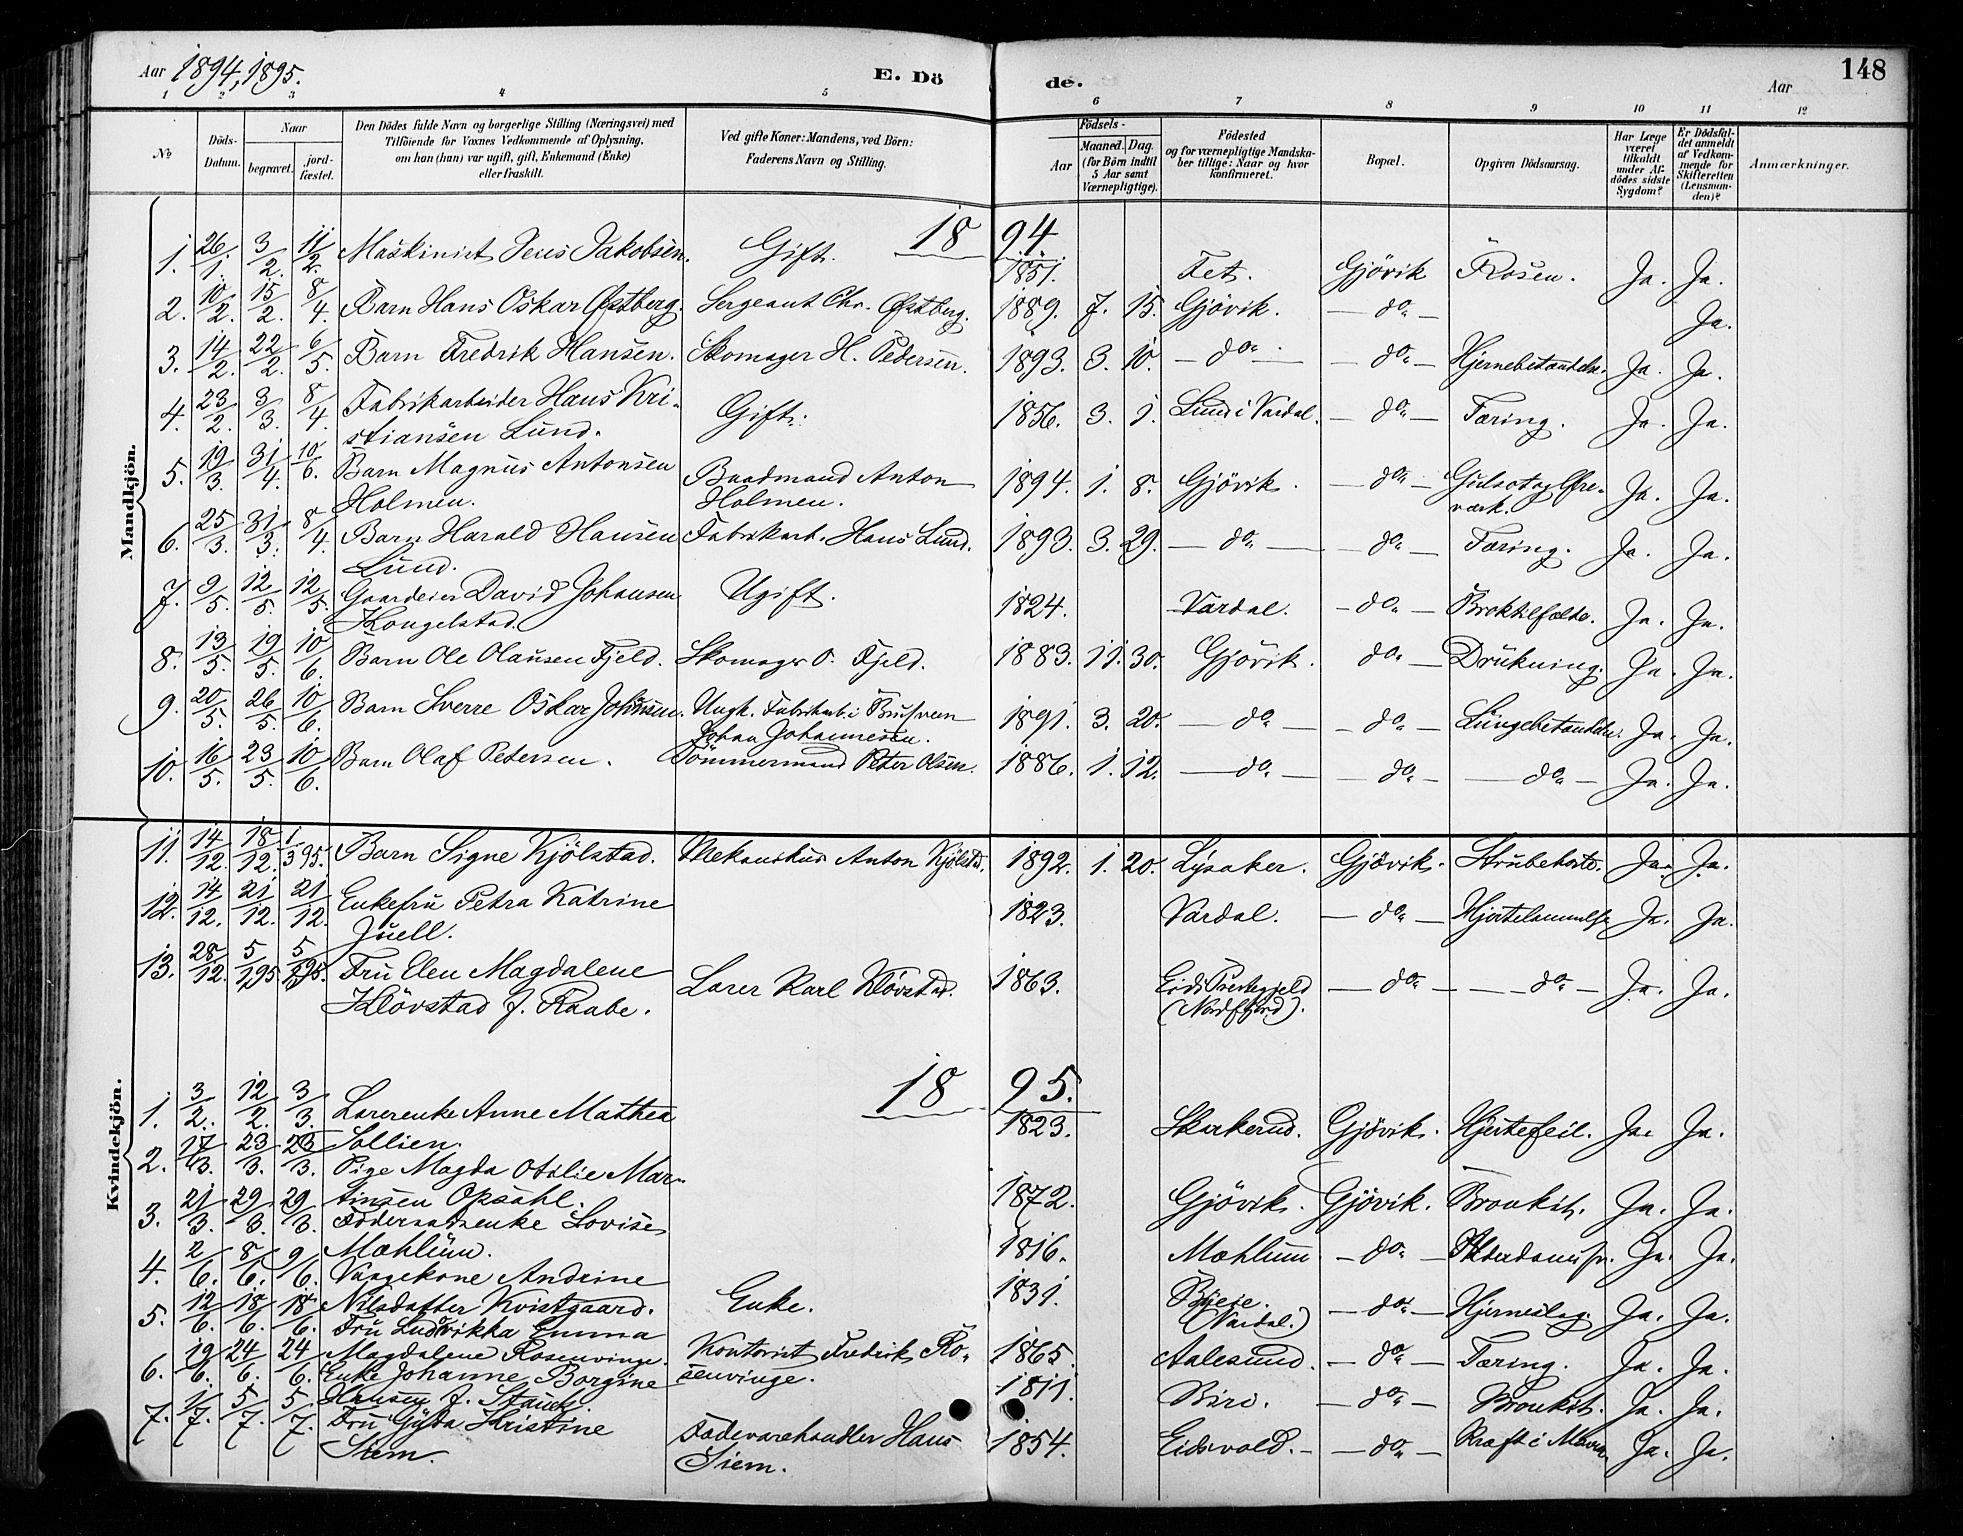 SAH, Vardal prestekontor, H/Ha/Haa/L0011: Ministerialbok nr. 11, 1891-1901, s. 148